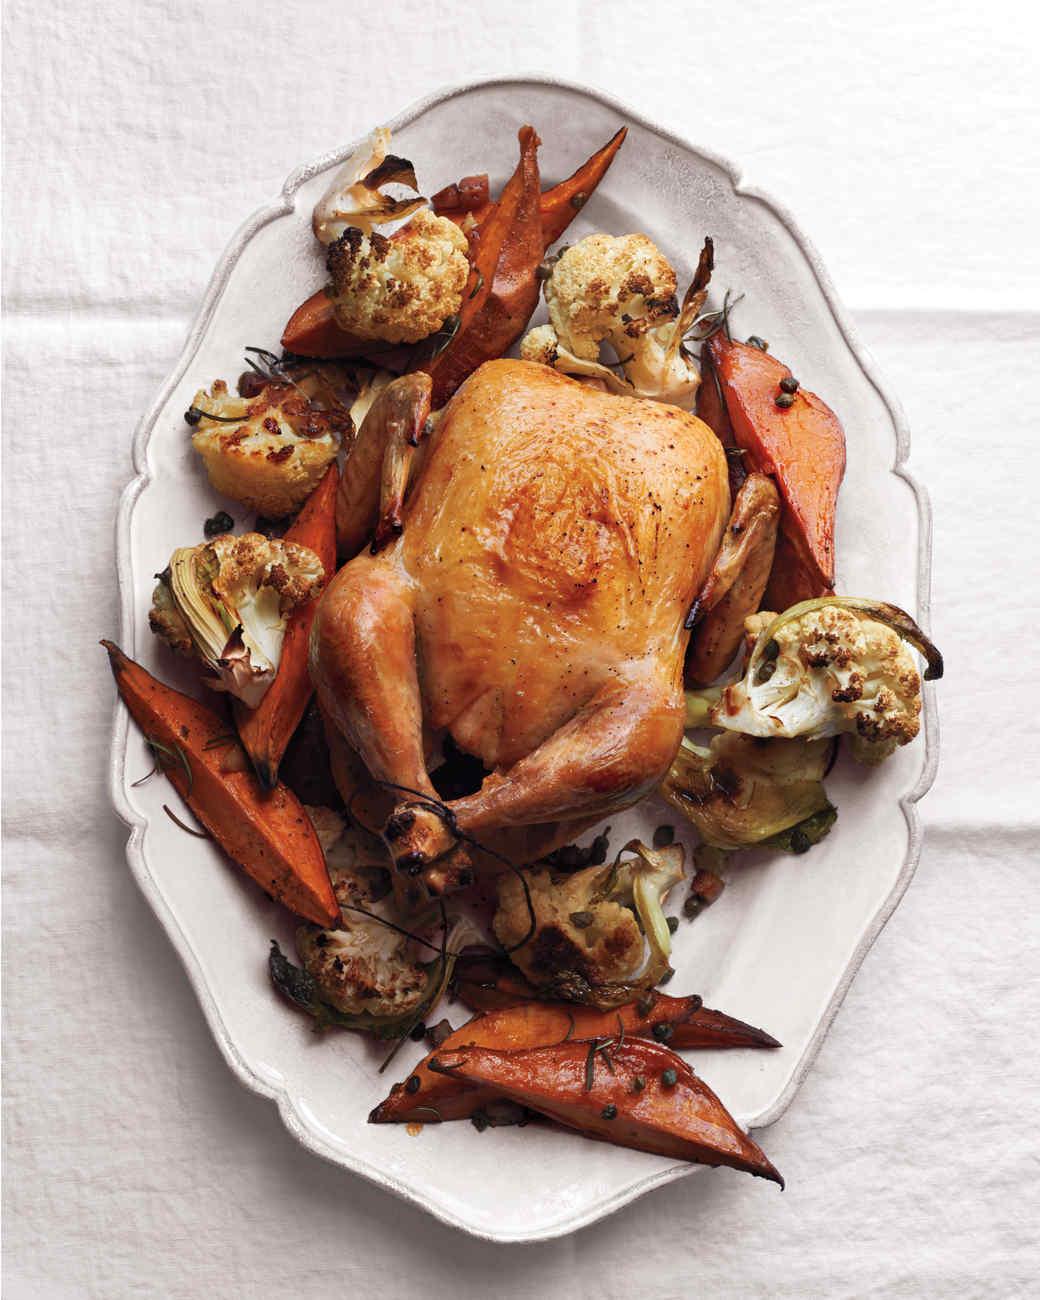 Roast Chicken with Cauliflower and Sweet Potatoes